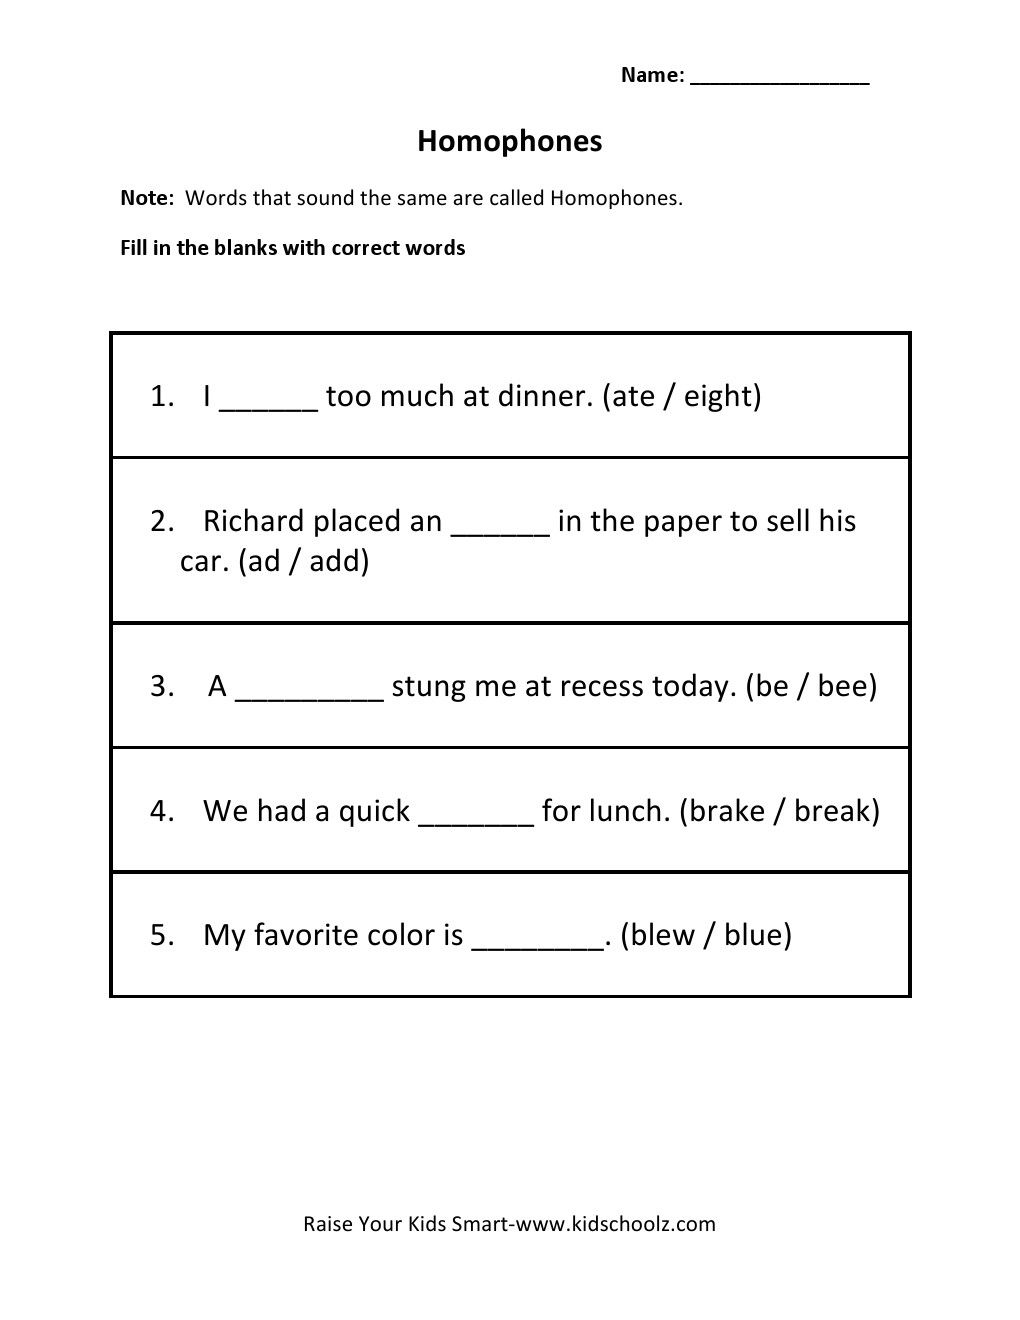 hight resolution of www.kidschoolz.com wp-content uploads 2014 09 homophones-1.jpg   2nd grade  worksheets